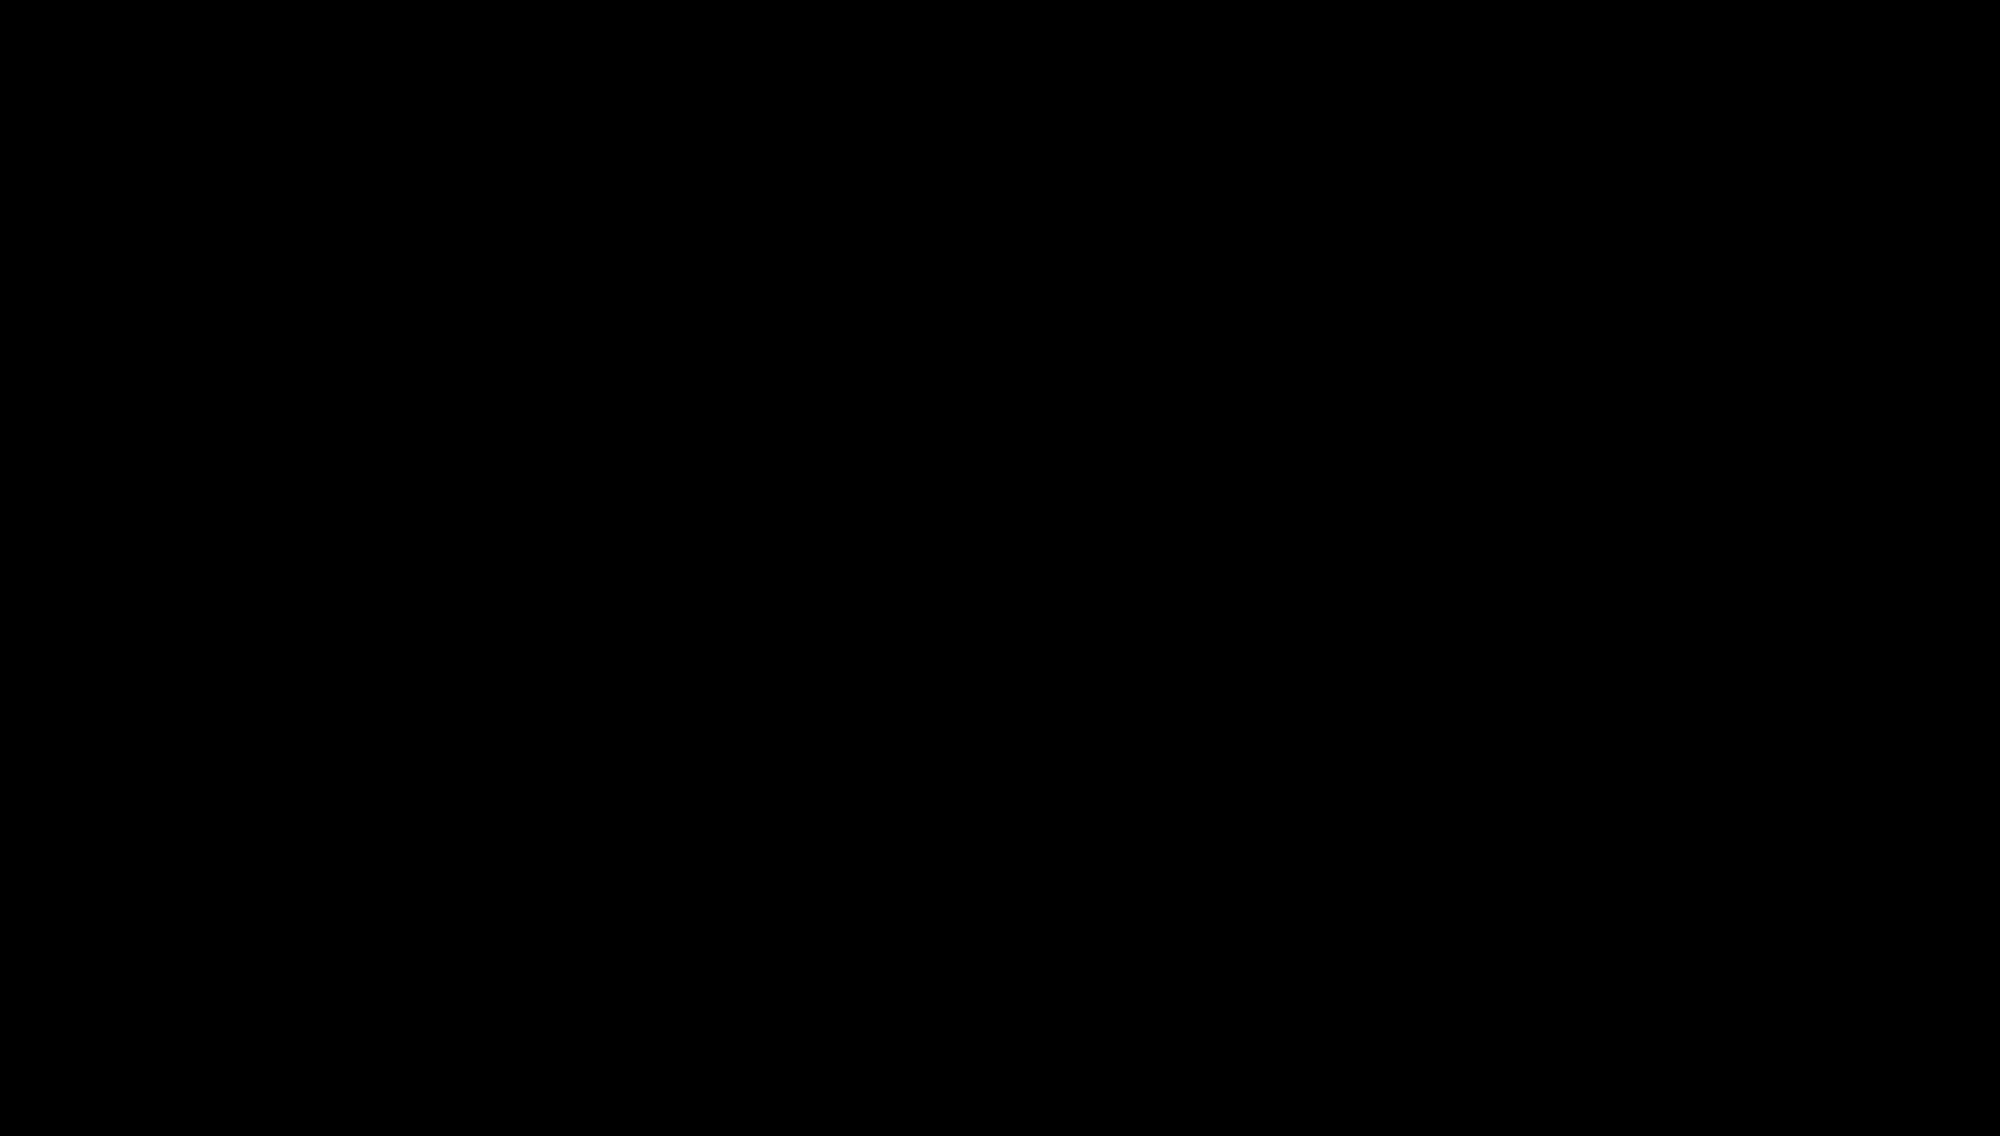 2000x1136 Filemq 1 Predator Silhouette.svg